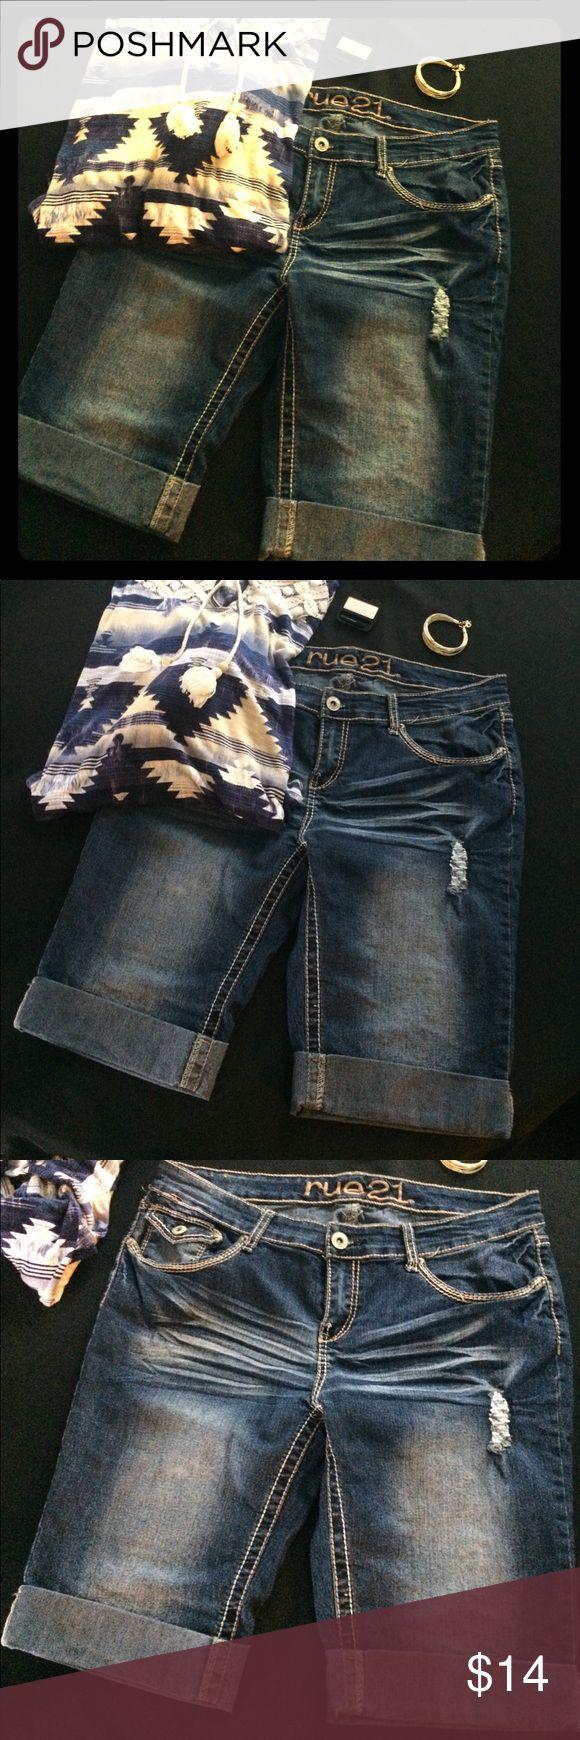 Rue 21 13/14 Curvy Jean shorts Rue 21 size 13/14 curvy- distressed Bermuda length Jean shorts Rue 21 Shorts Bermudas